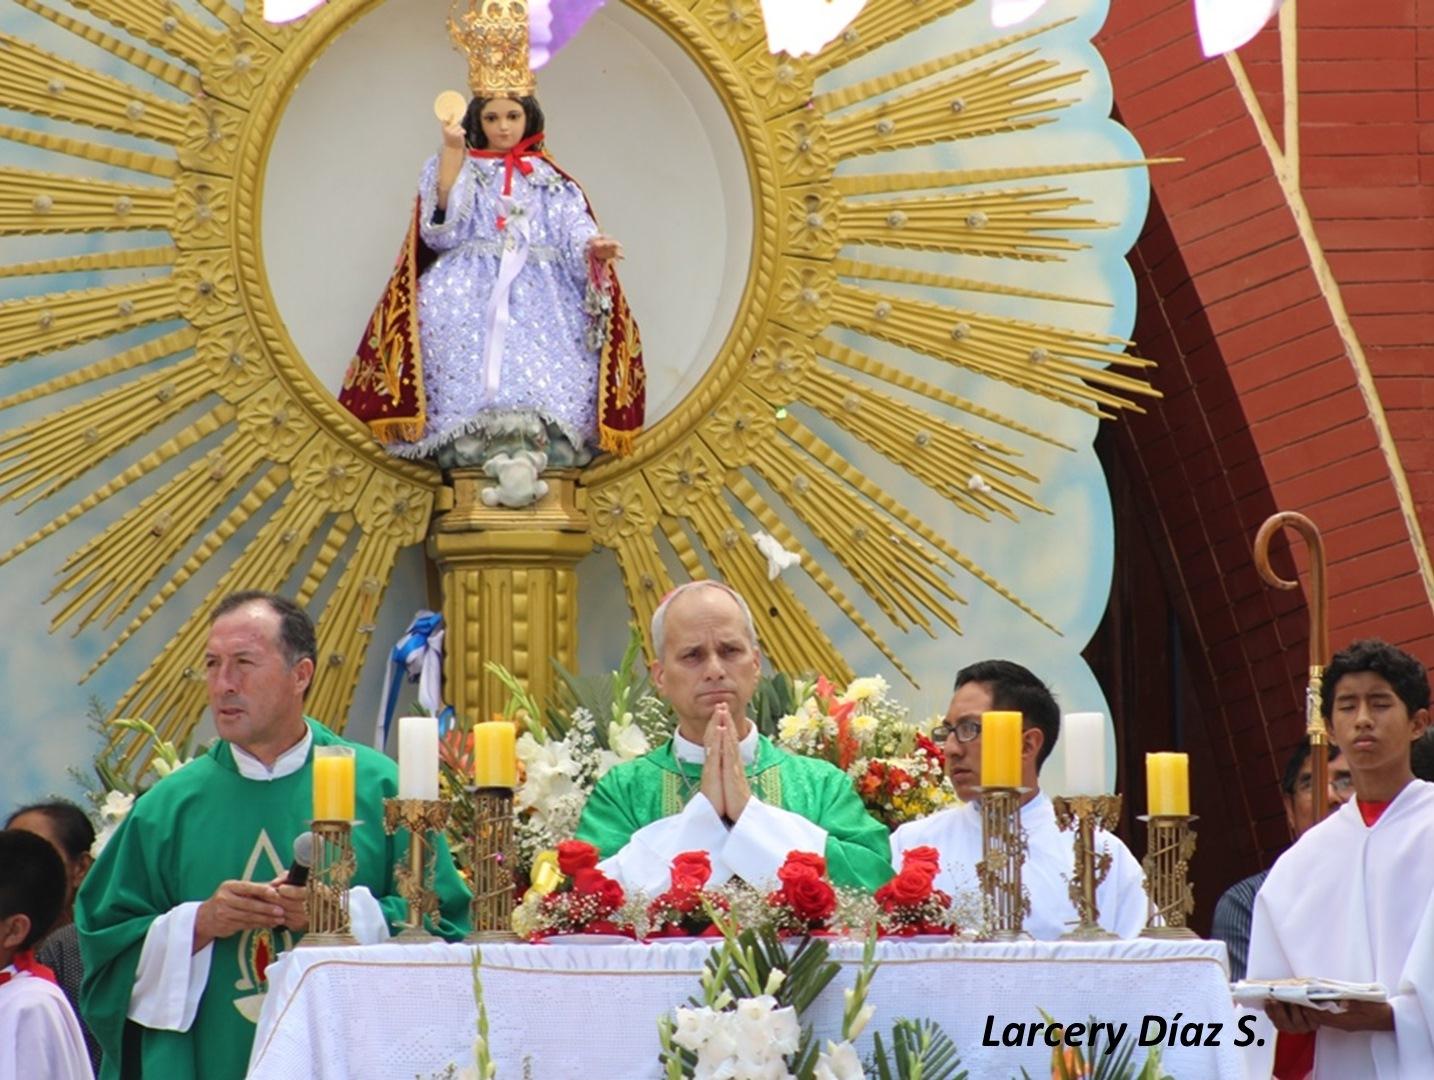 Matrimonio Catolico Origen : Matrimonio catolico homilia ¡histÓrico rumanía aprueba